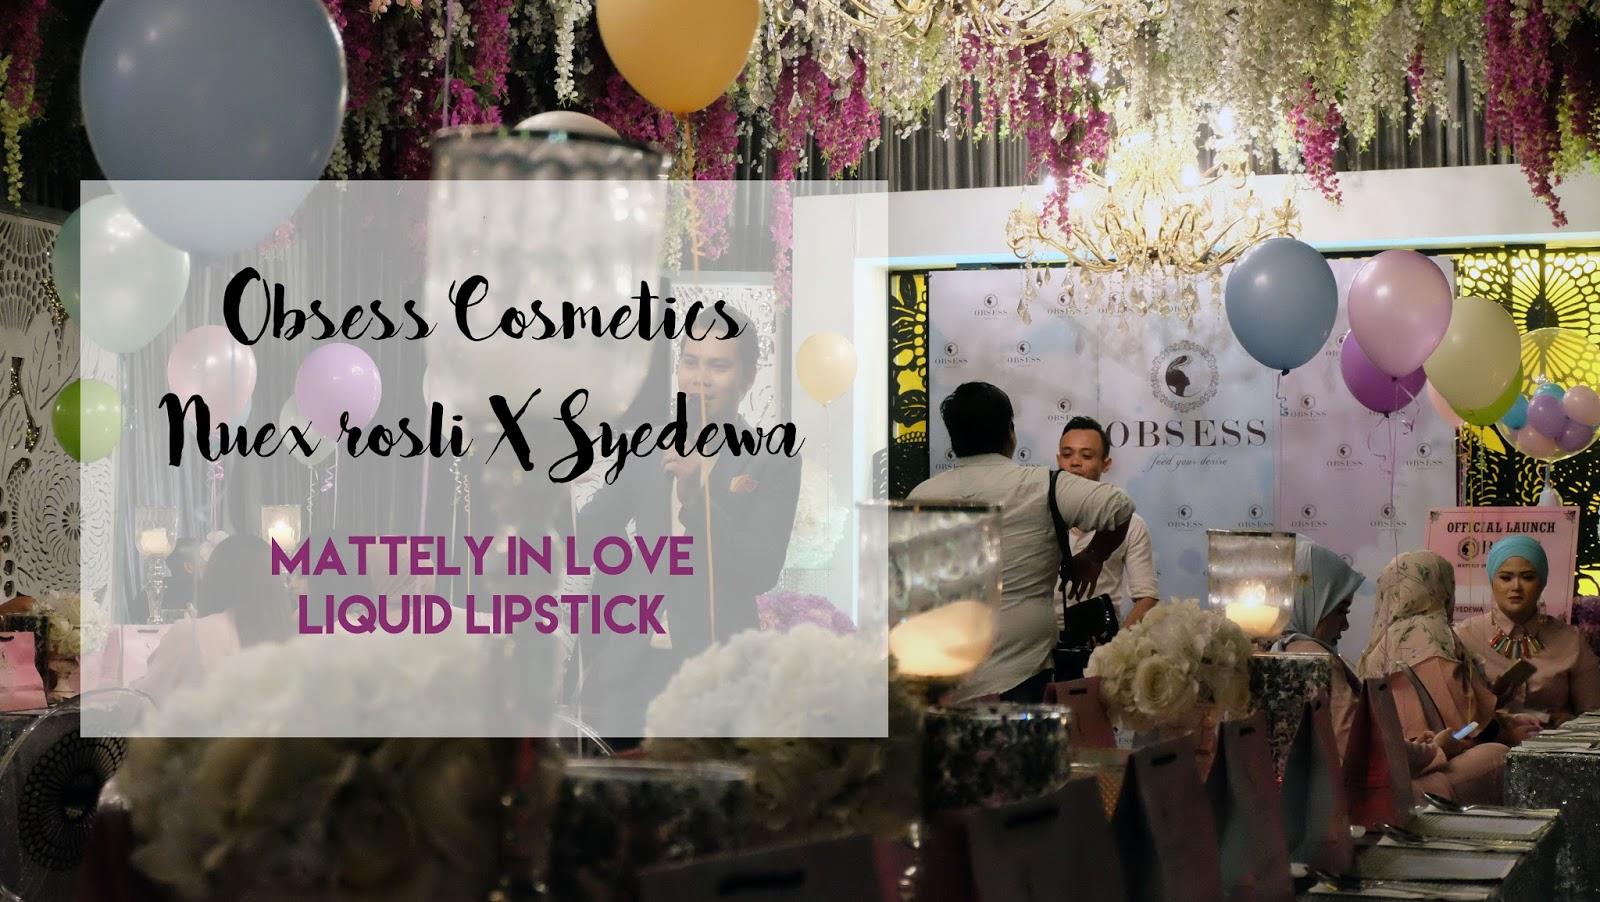 Obsess Cosmetics: Syedewa & Nuex Rosli Liquid Matte Lipstick